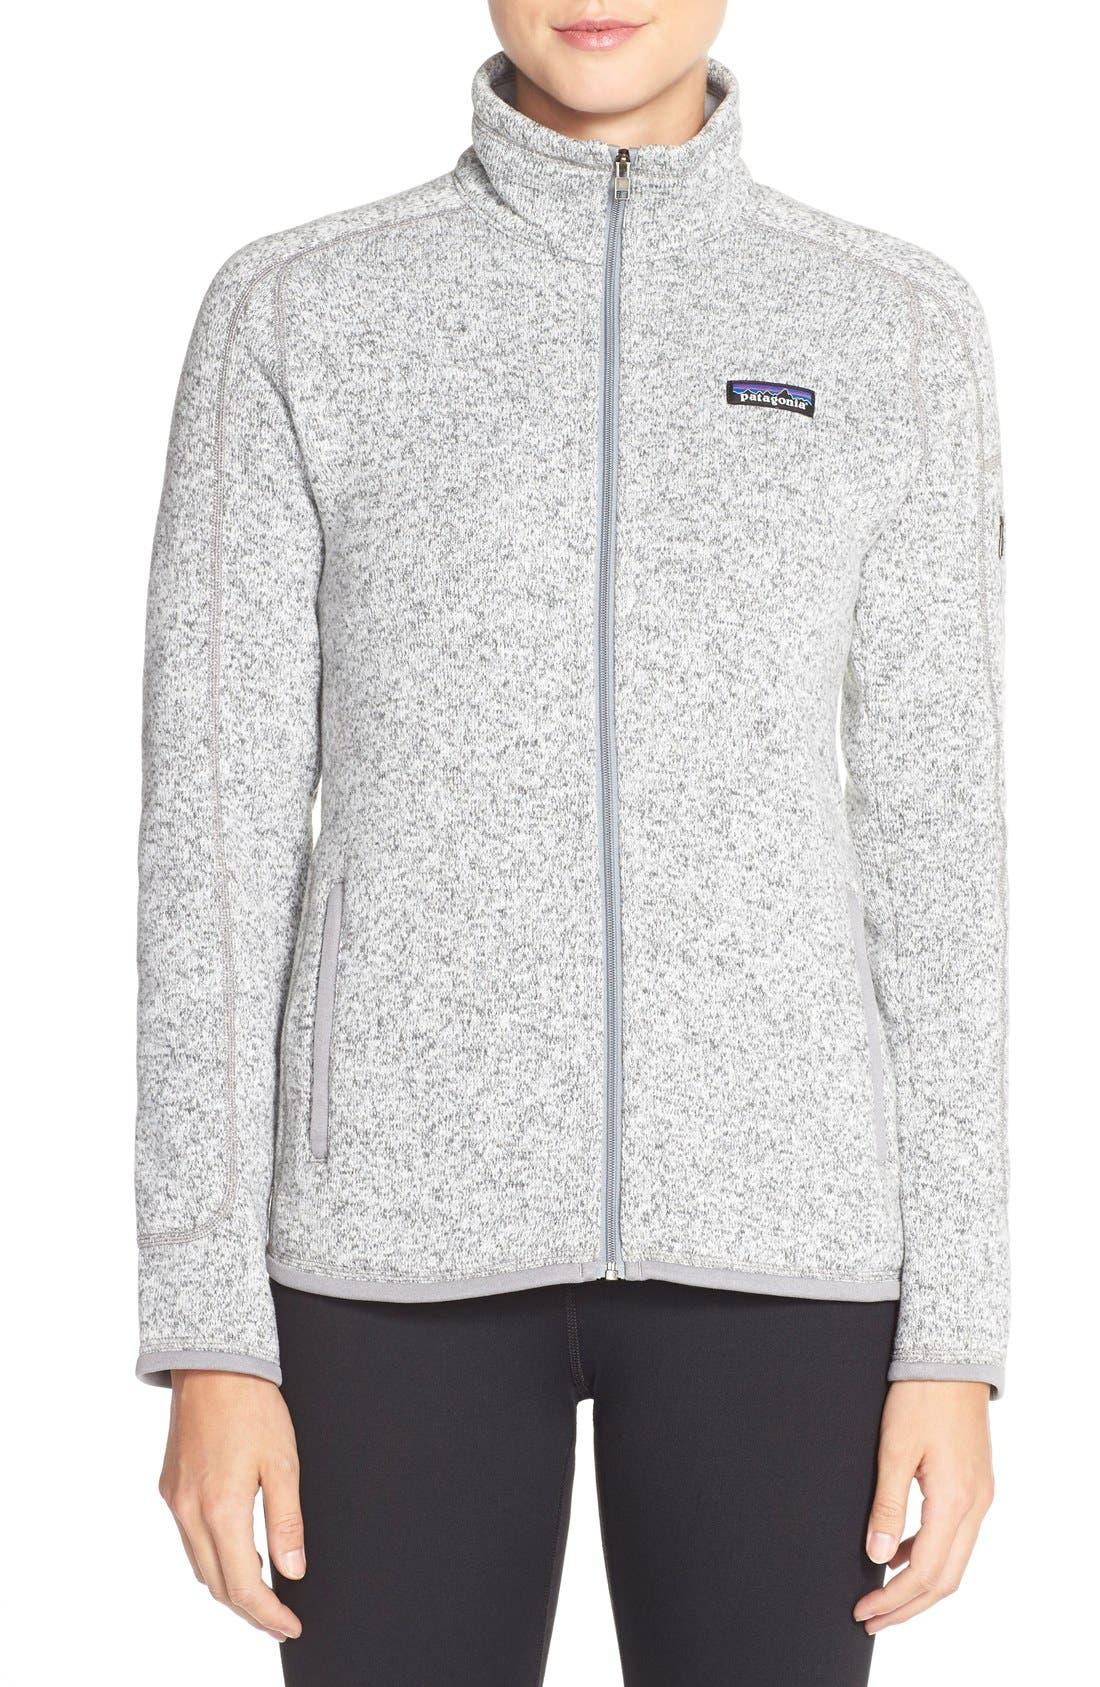 Main Image - Patagonia 'BetterSweater' Jacket